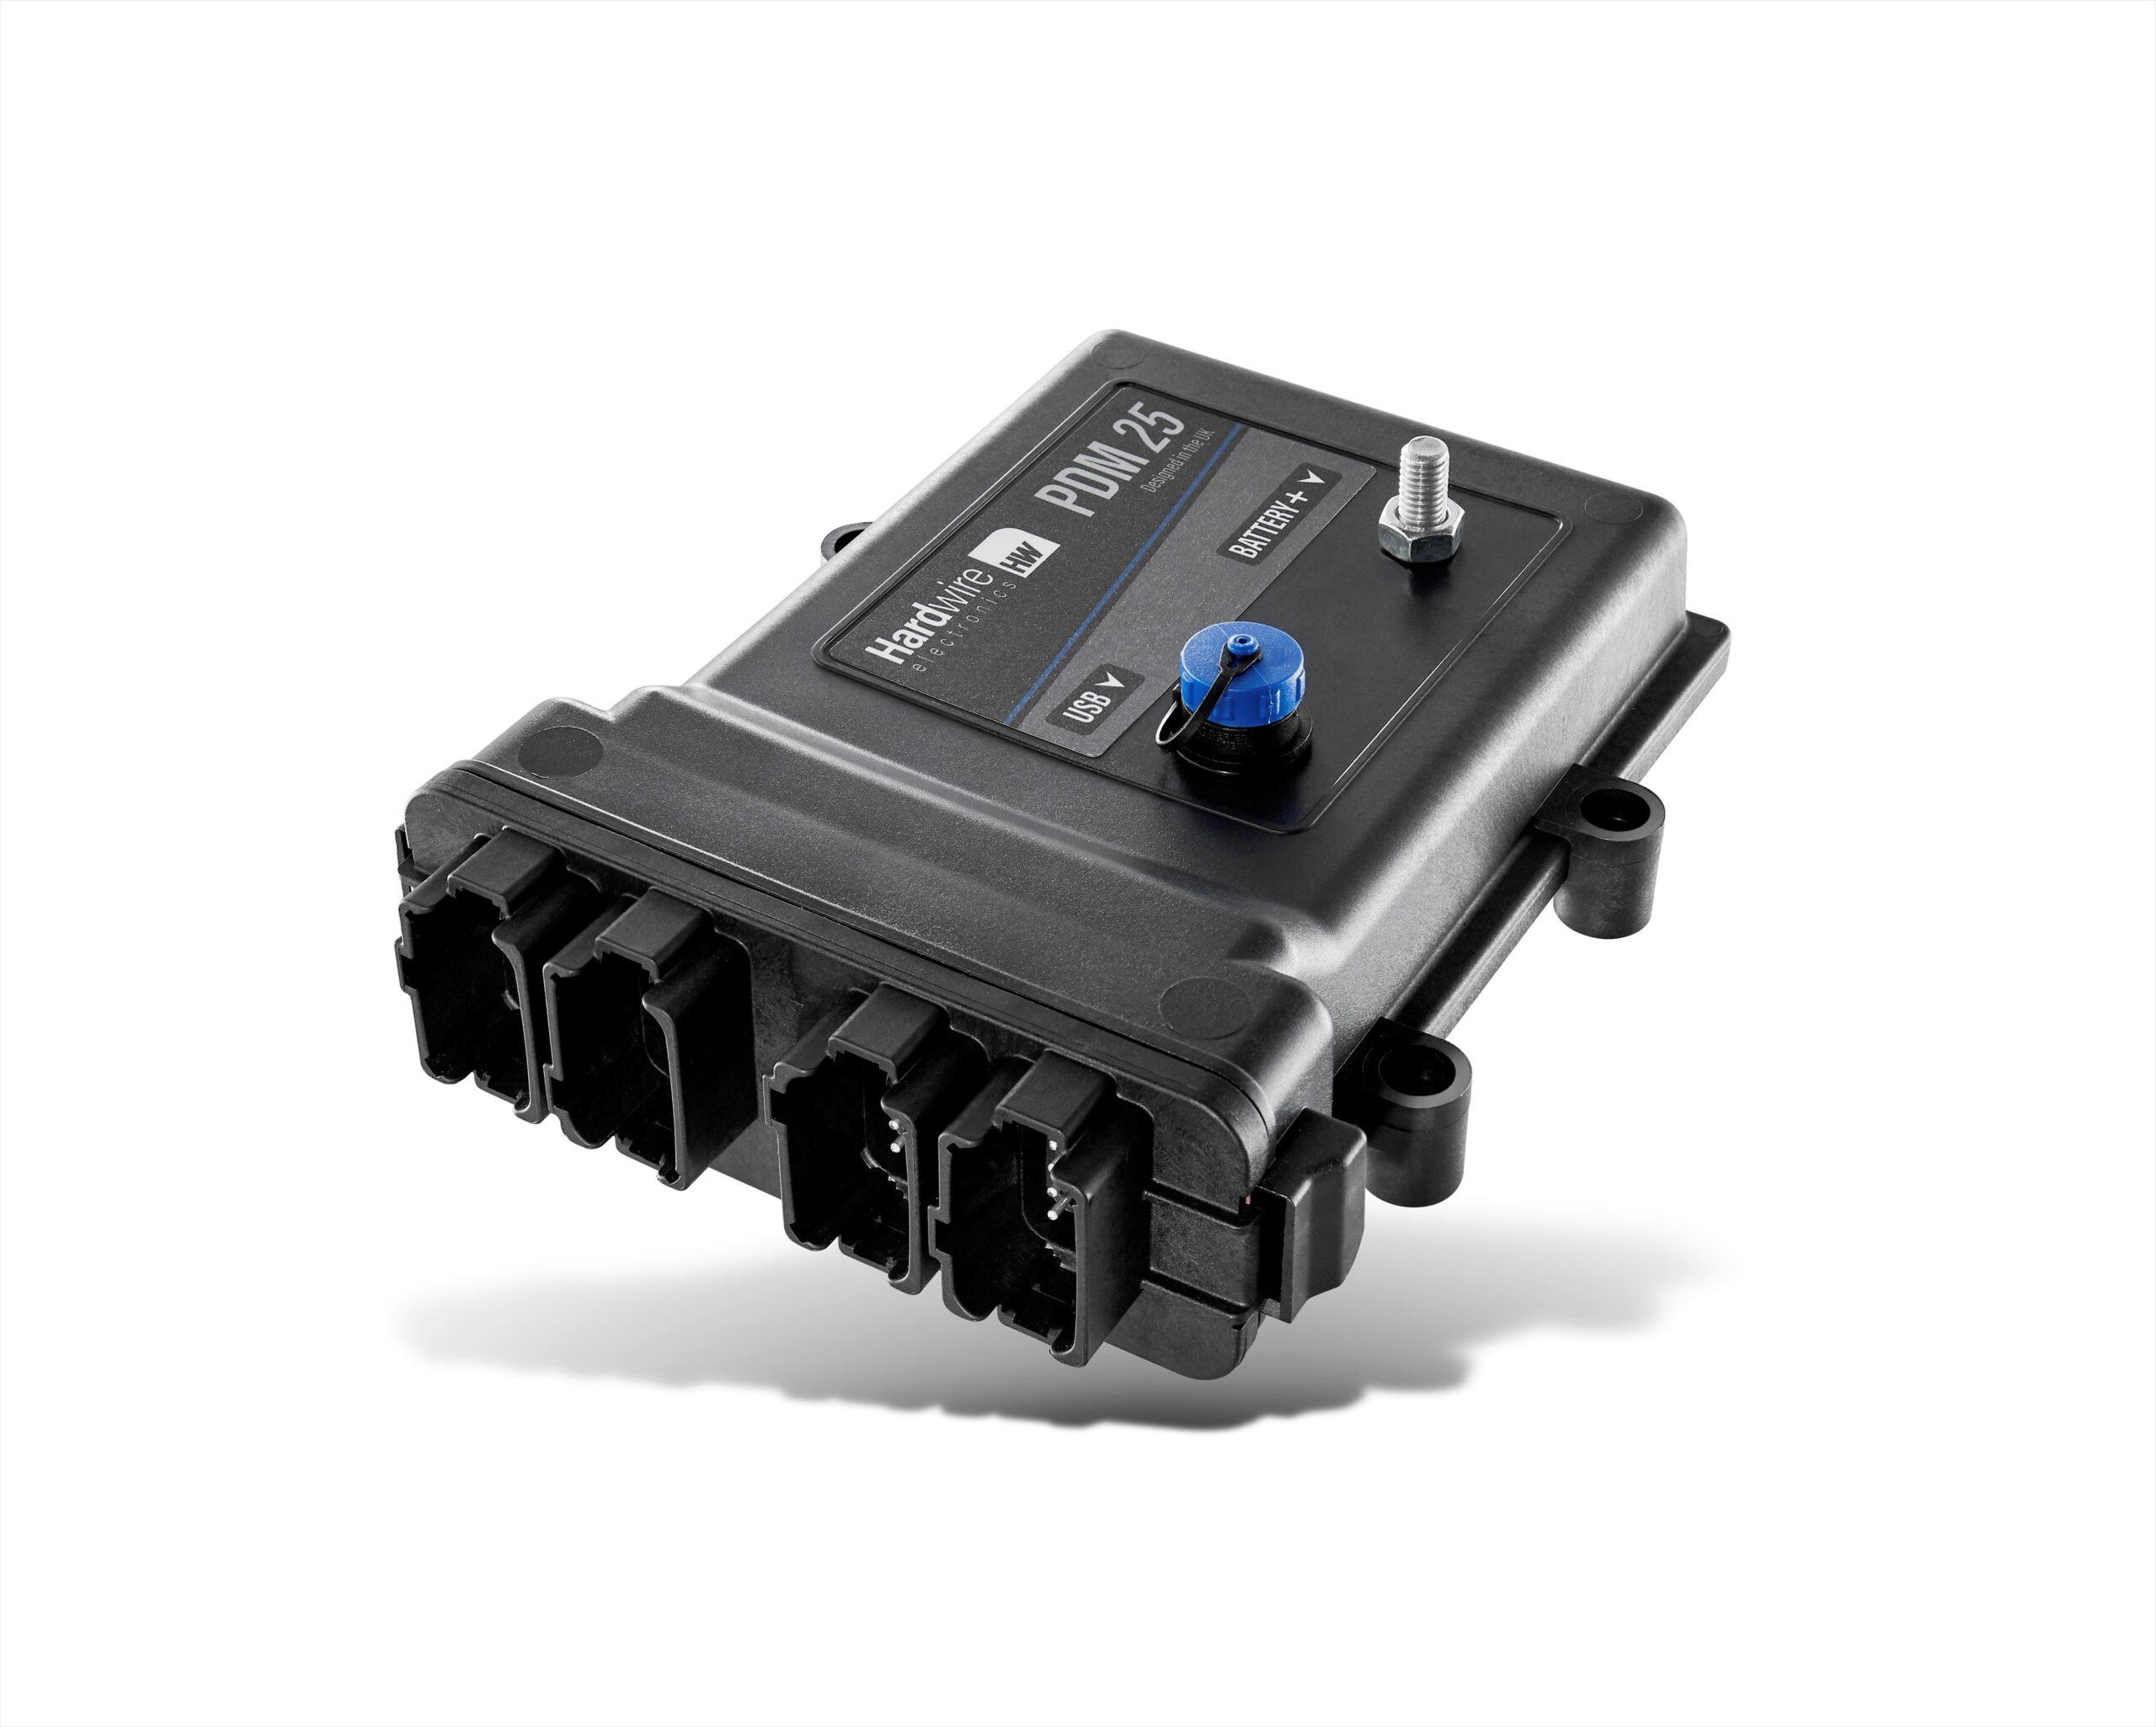 Hardwire PDM25